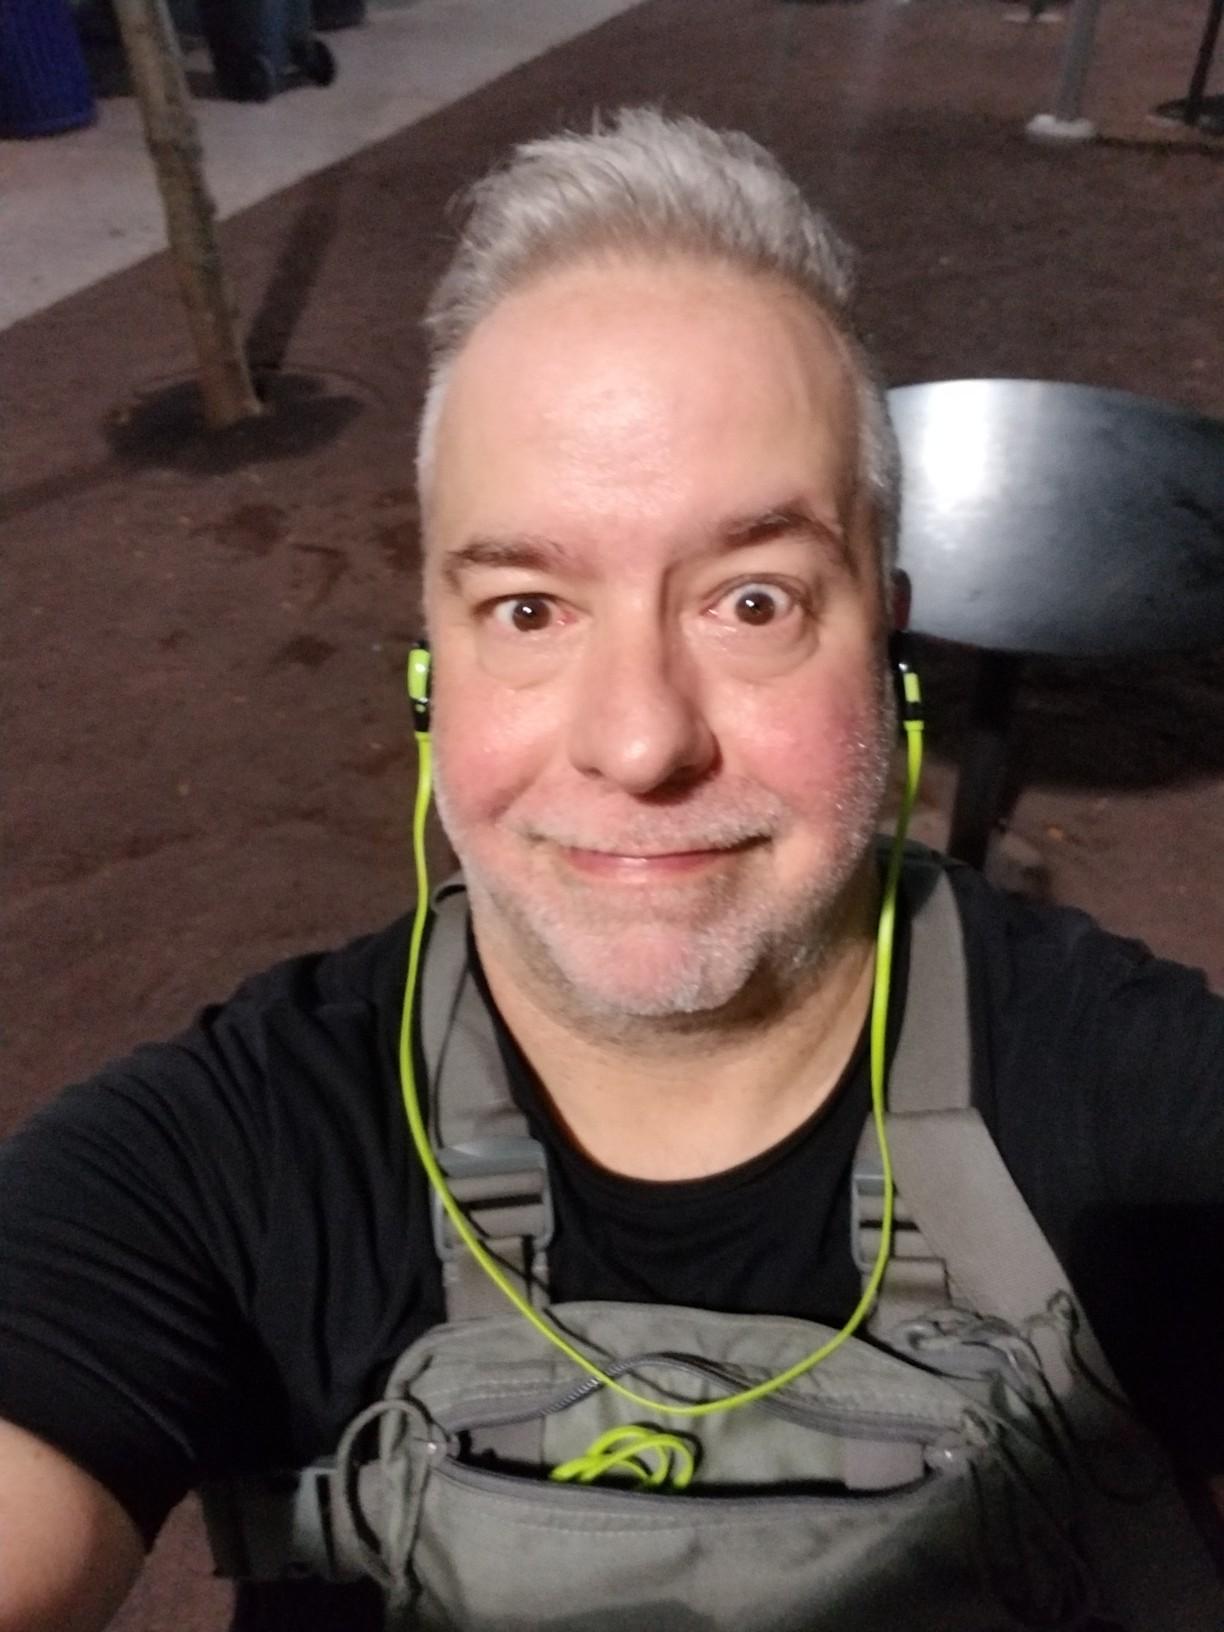 Running: Sat, 28 Jul 2018 21:32:39: Third run of the rest of my life!